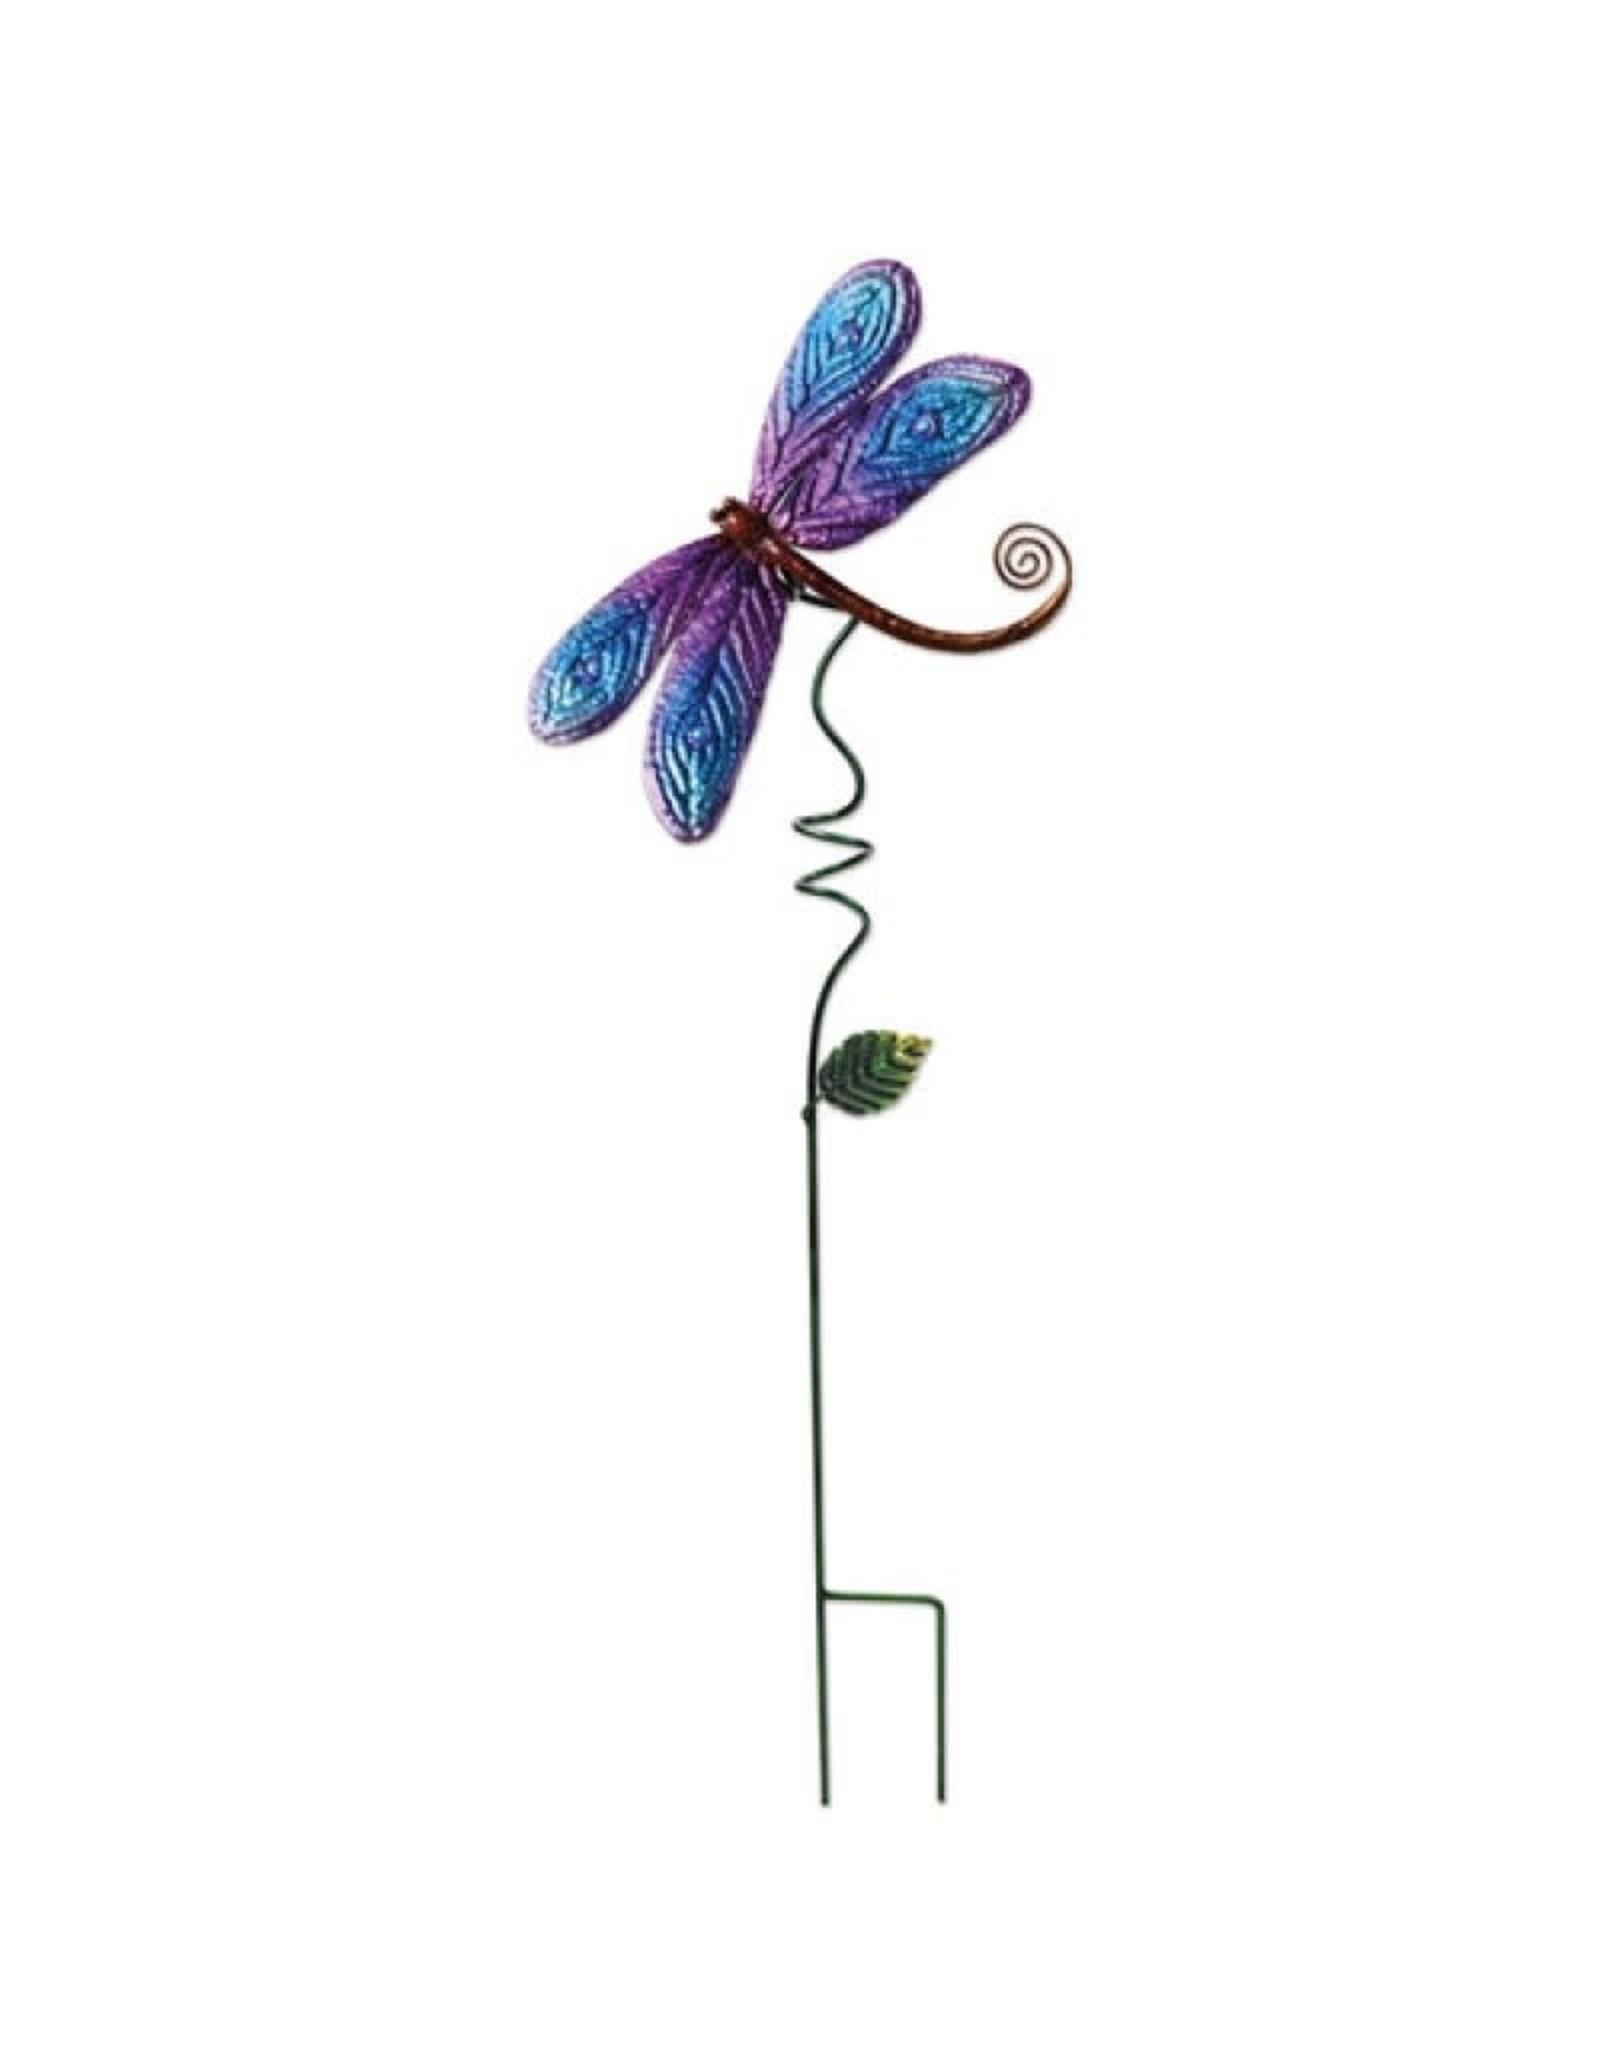 Garden Stake - Dragonfly Blue/Purple 28''